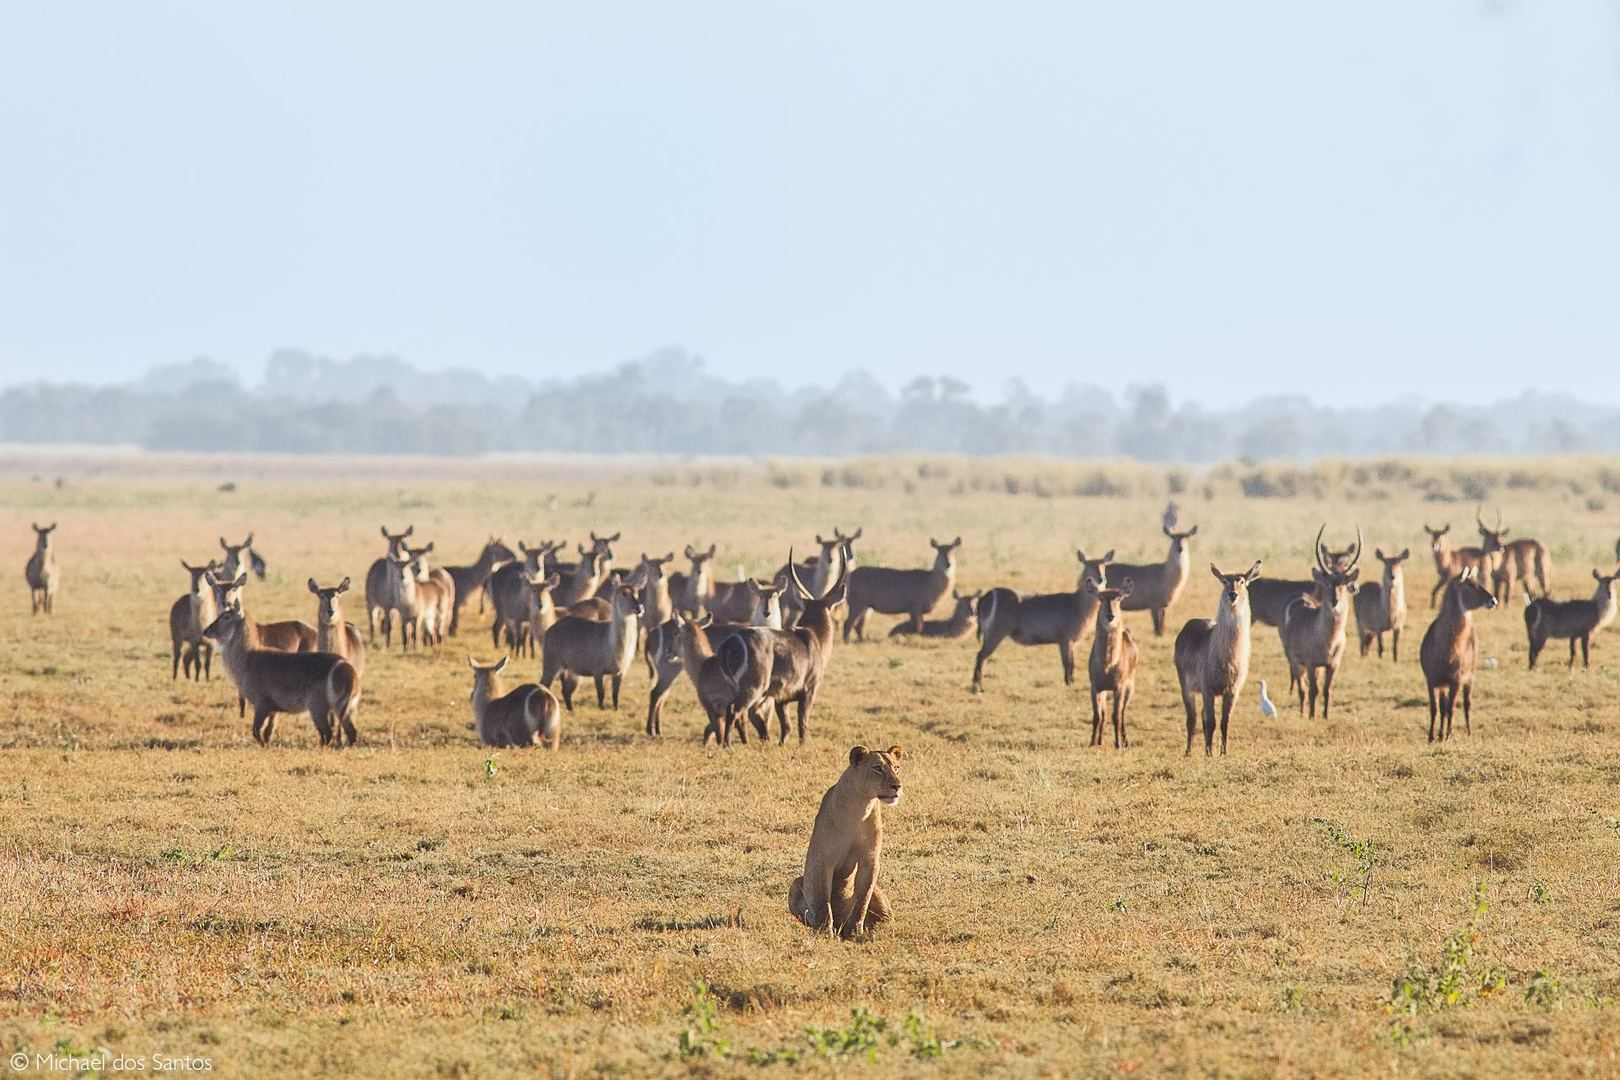 Lion and herd (c) Michael dos Santos